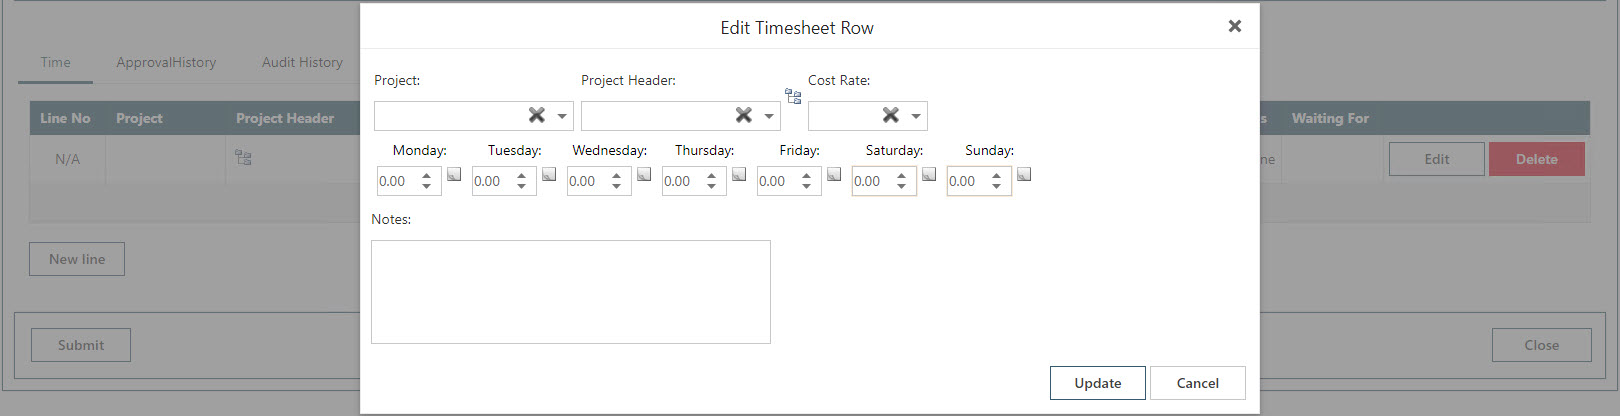 WAP Timesheets help and user guide - Timesheet HUG Section 10.1 Image 2